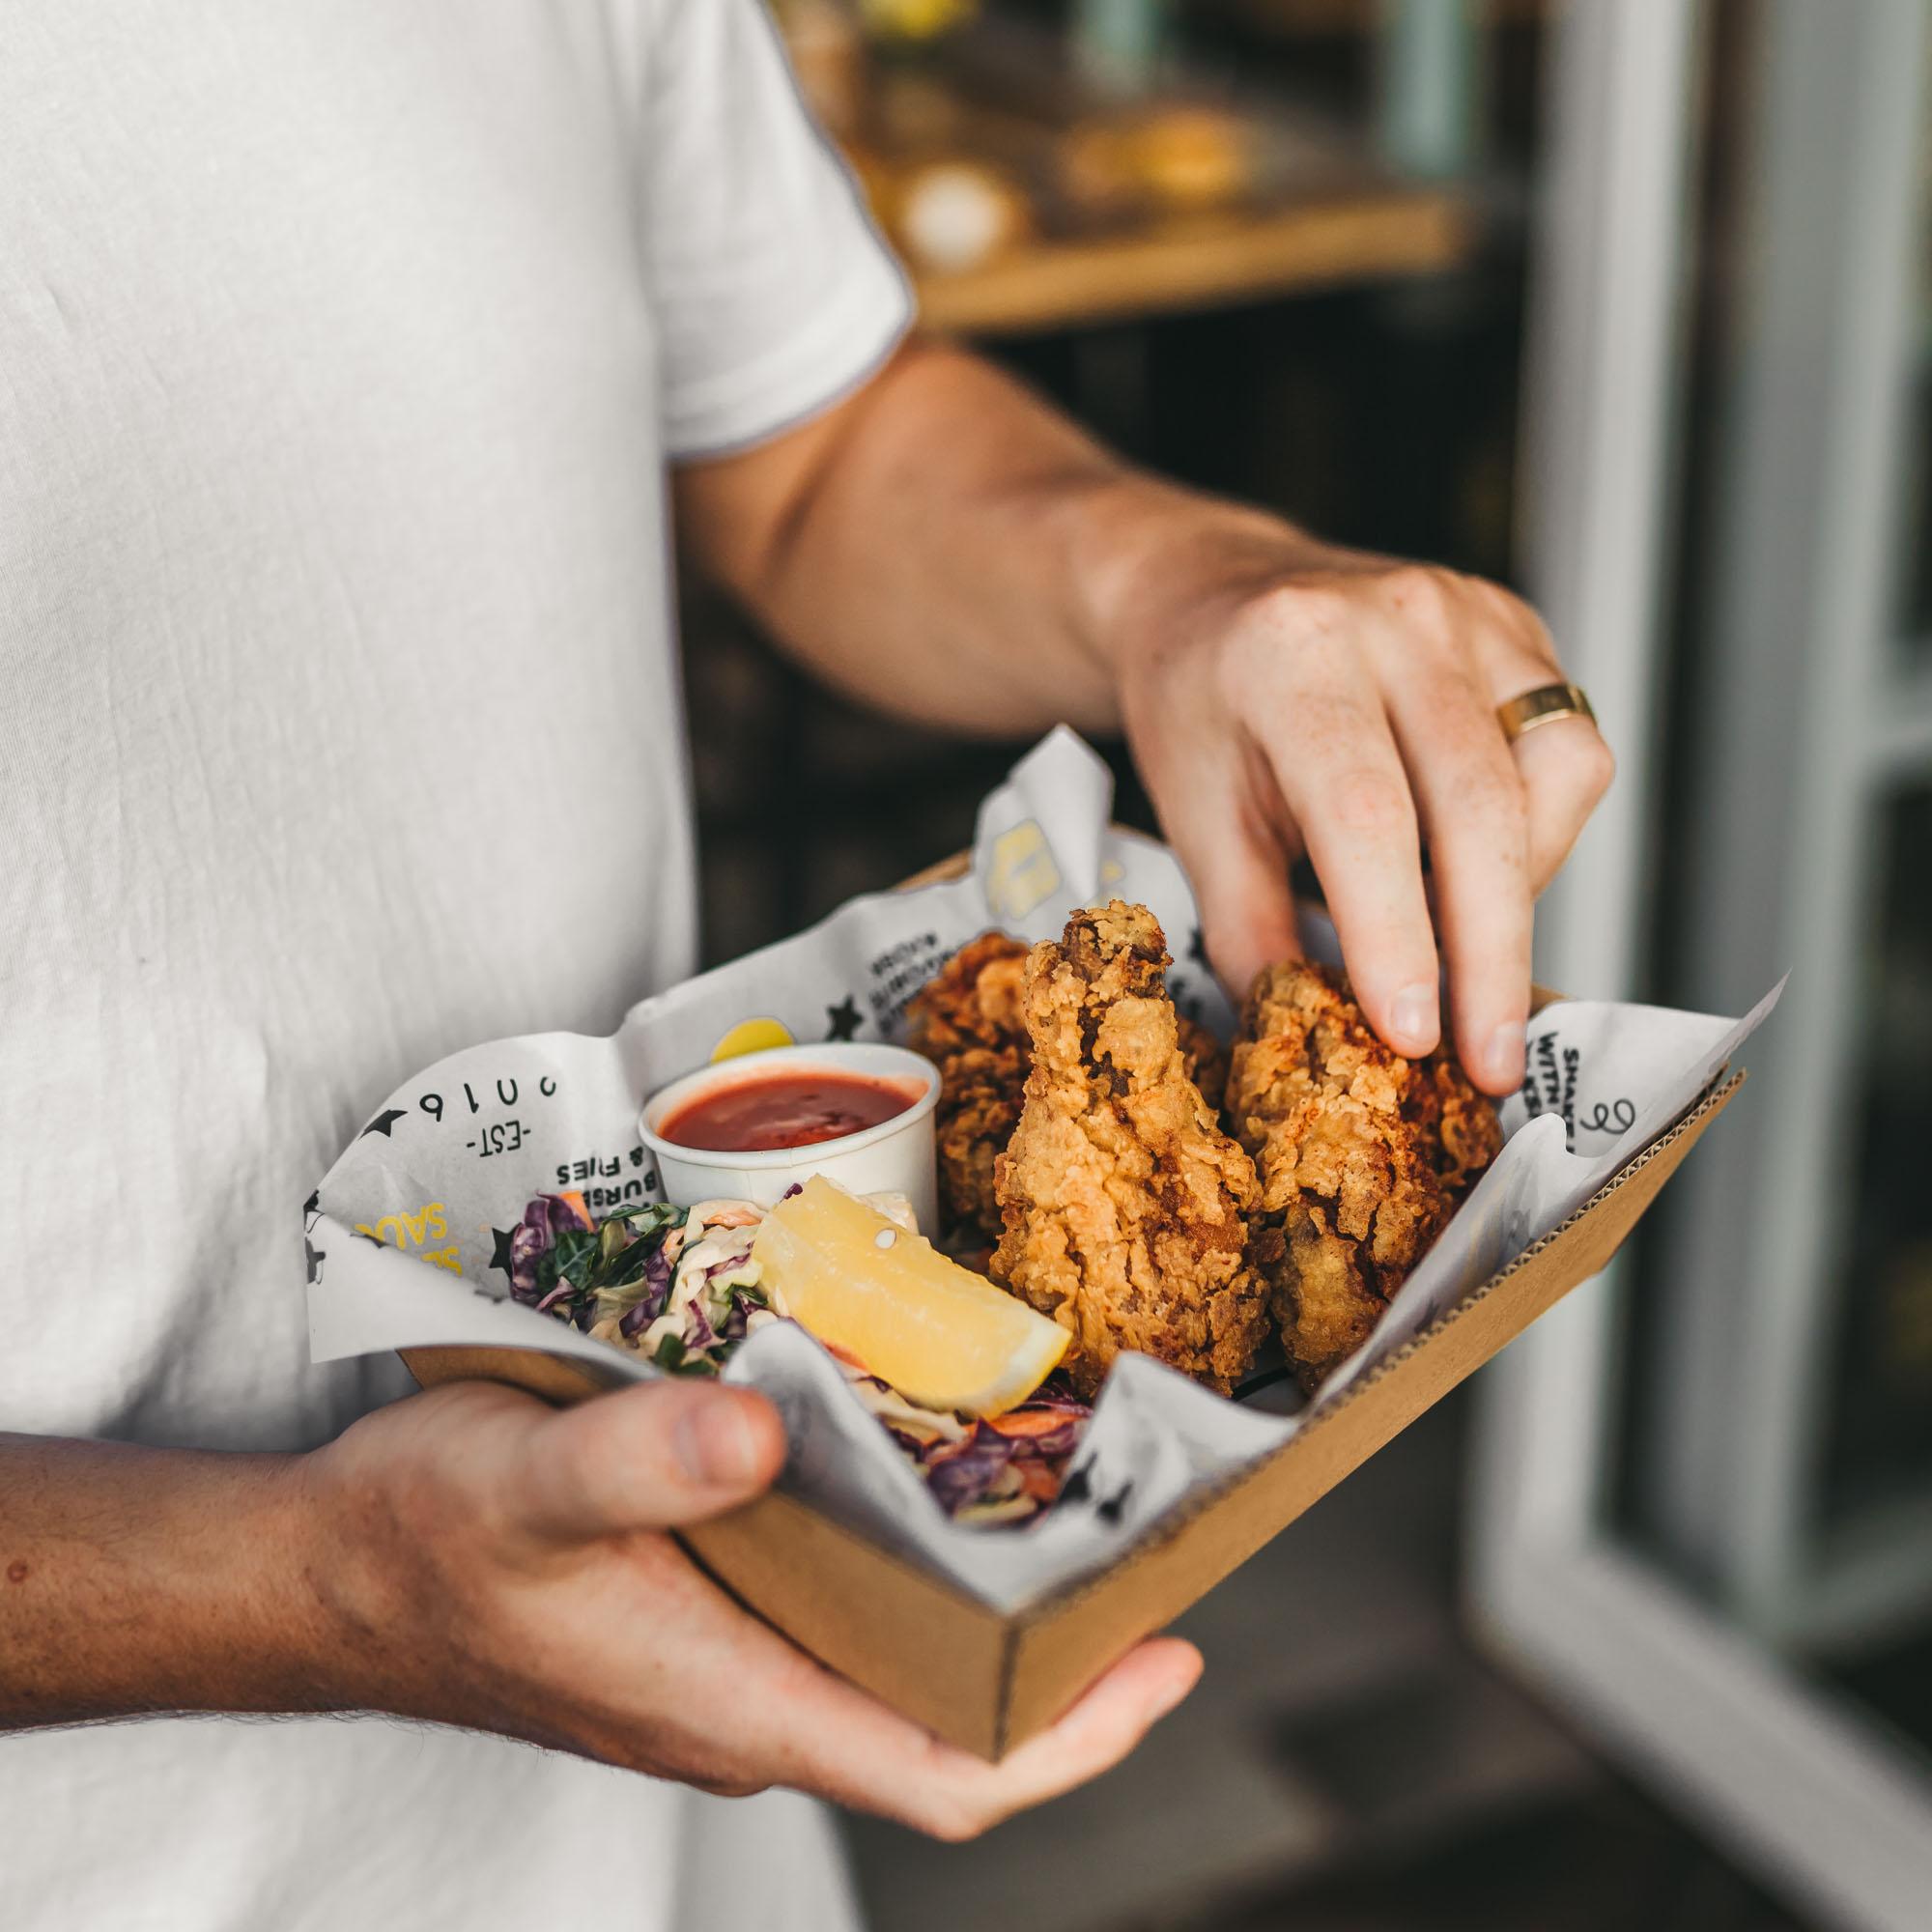 keira-mason-shmurger-burger-chicken-wings.jpg